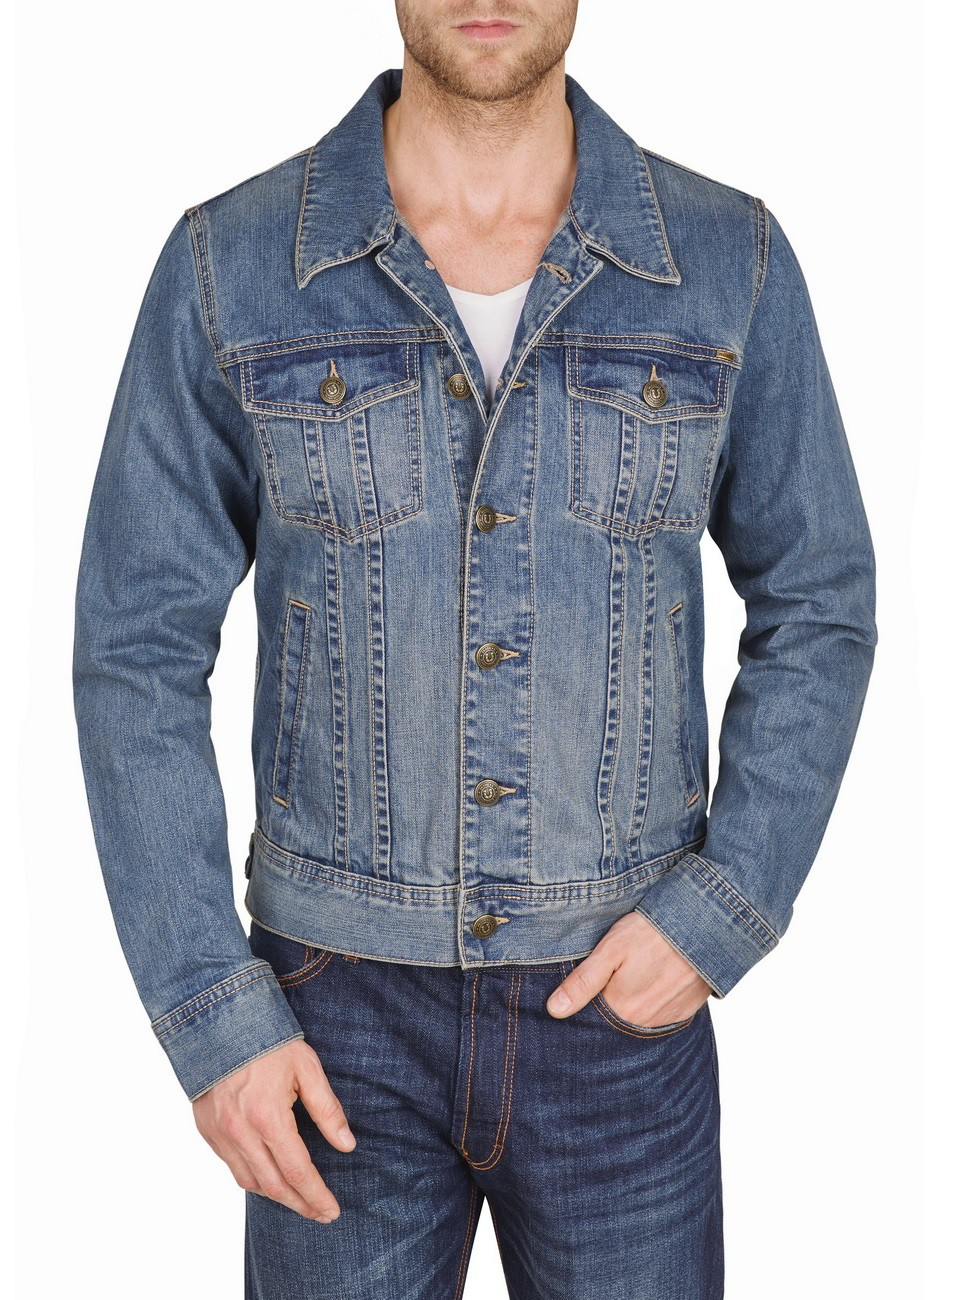 paddock s herren jeansjacke western jacket blau ebay. Black Bedroom Furniture Sets. Home Design Ideas